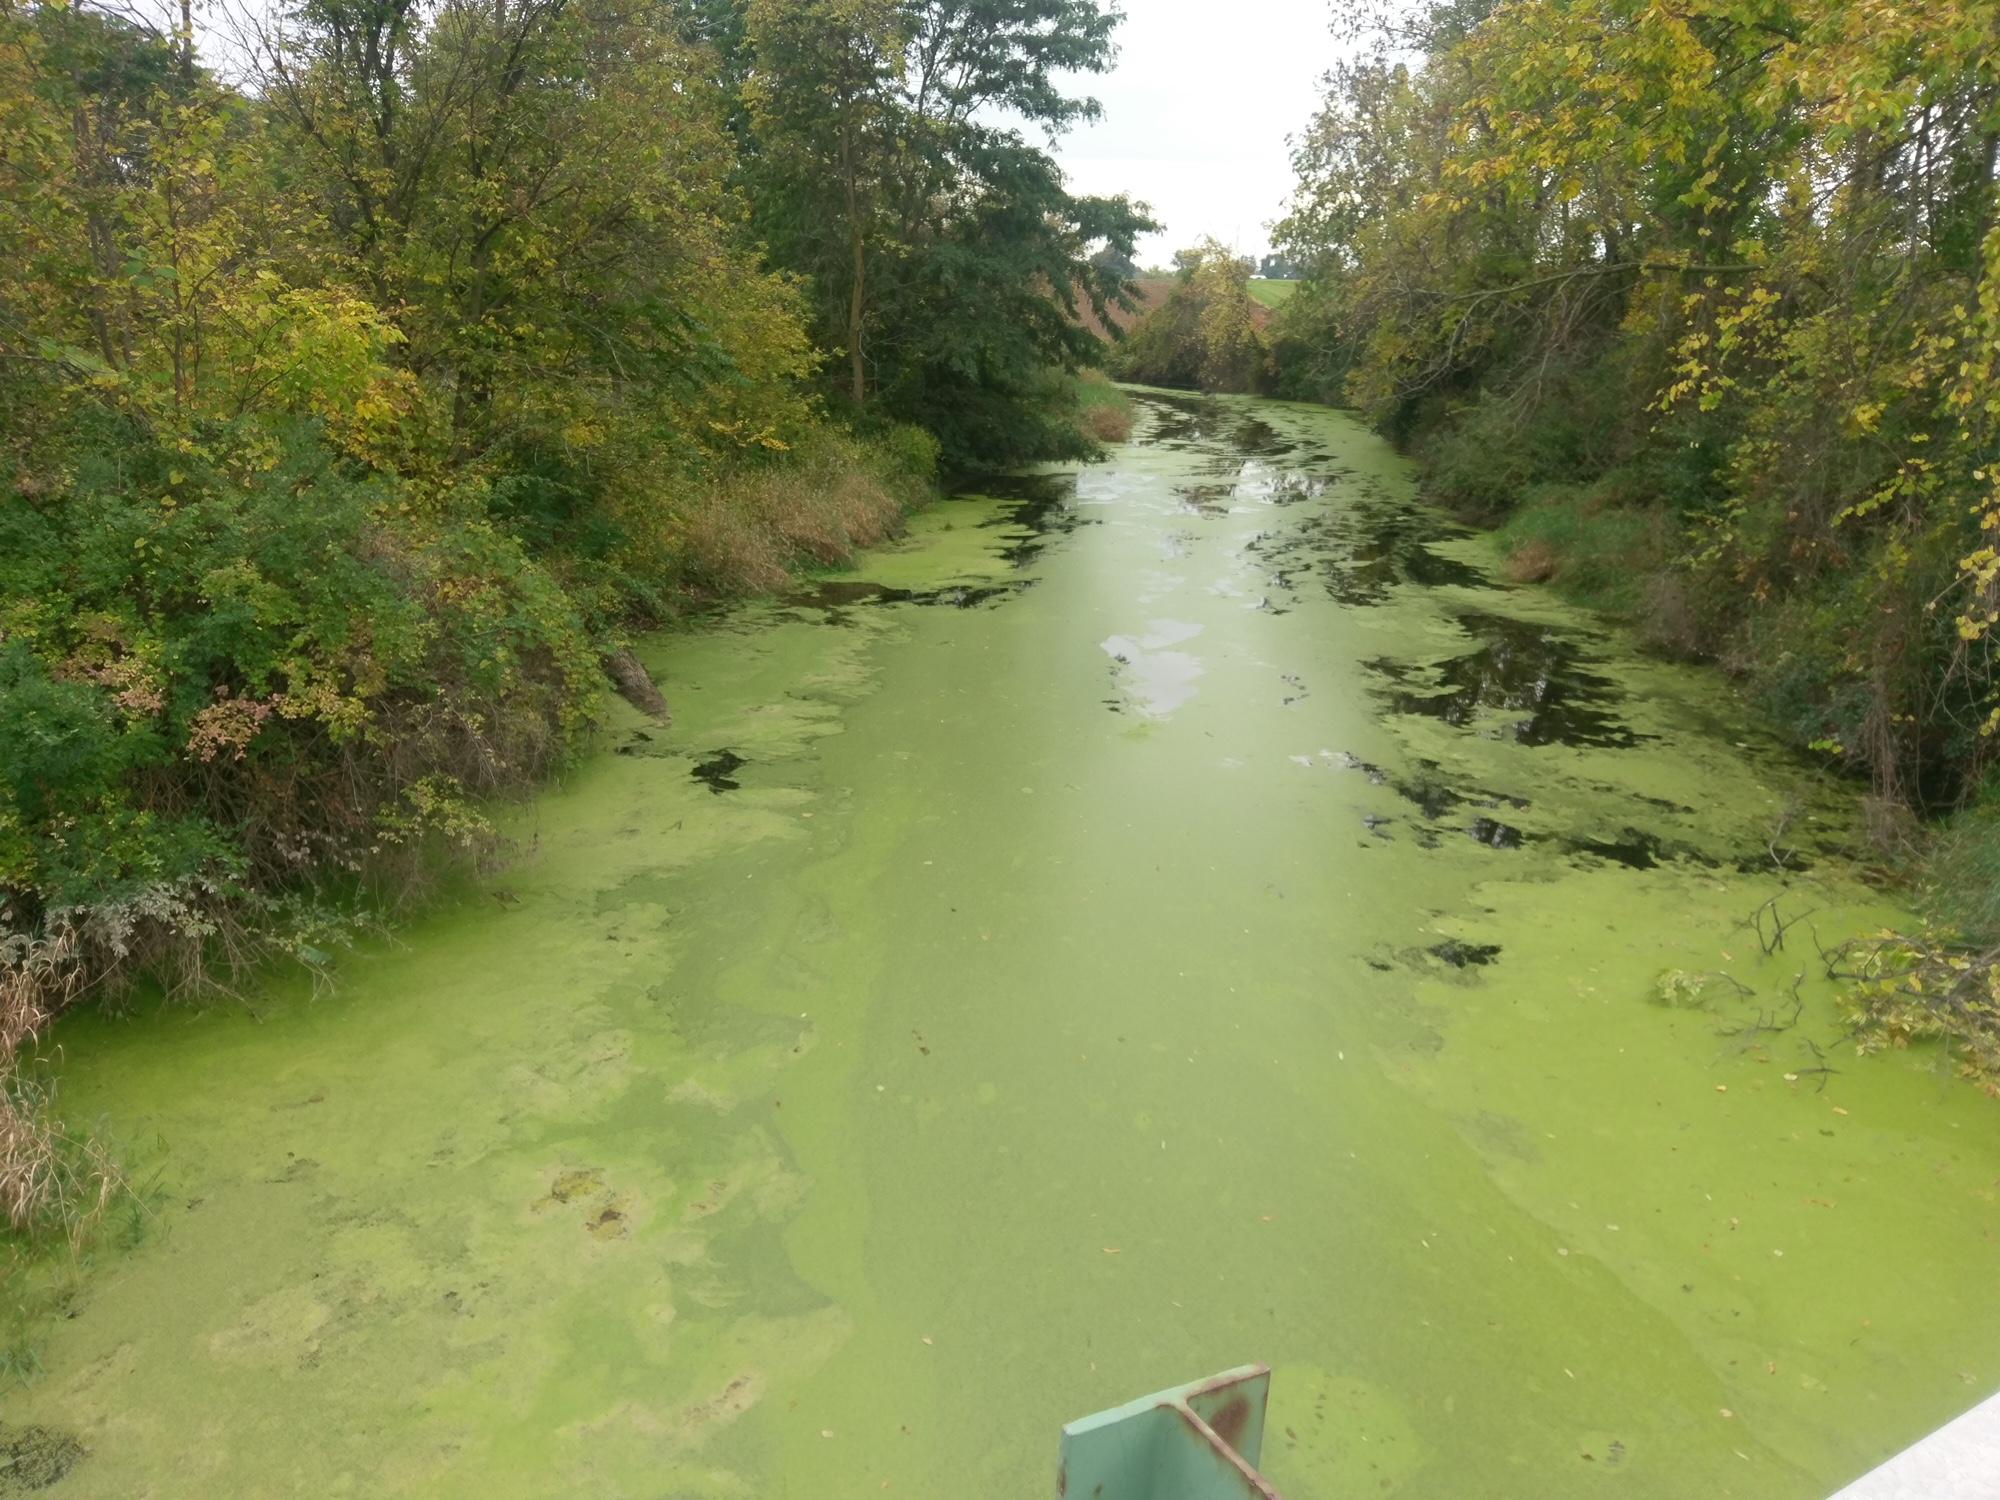 5th Annual FL Harmful Algal Bloom Meeting Next Month